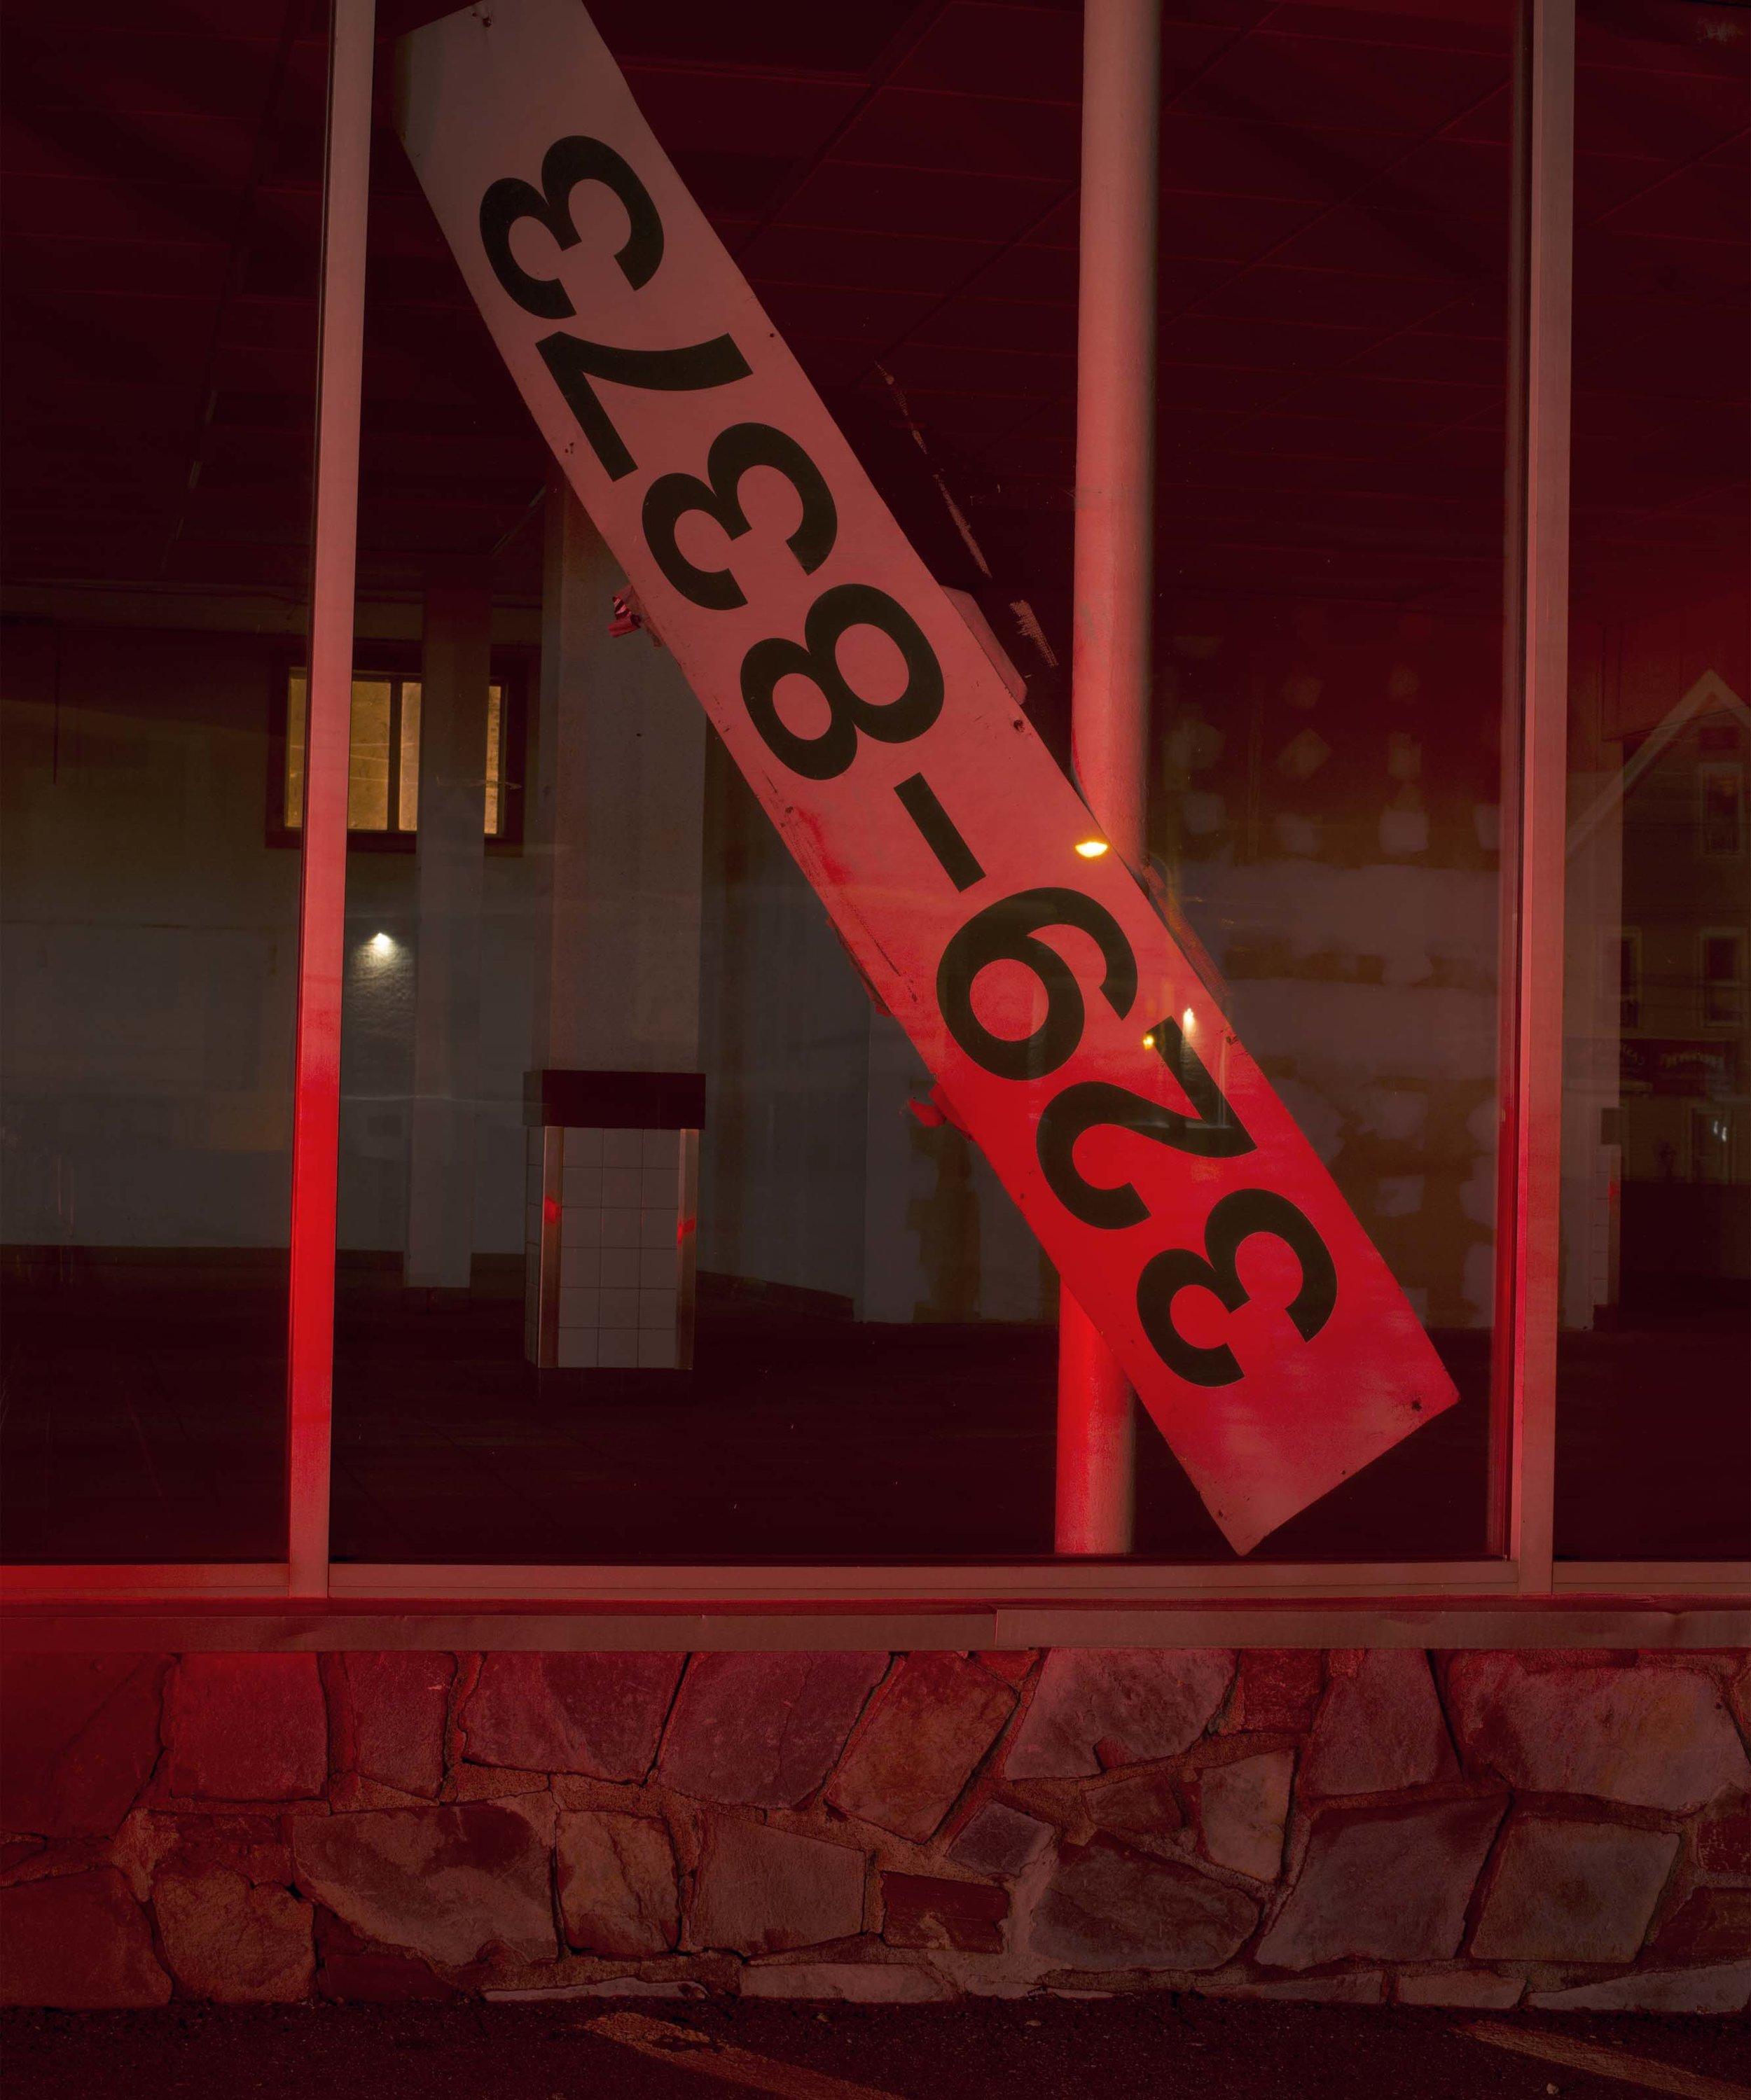 329-8373 (Red), near Boston MA, 2014